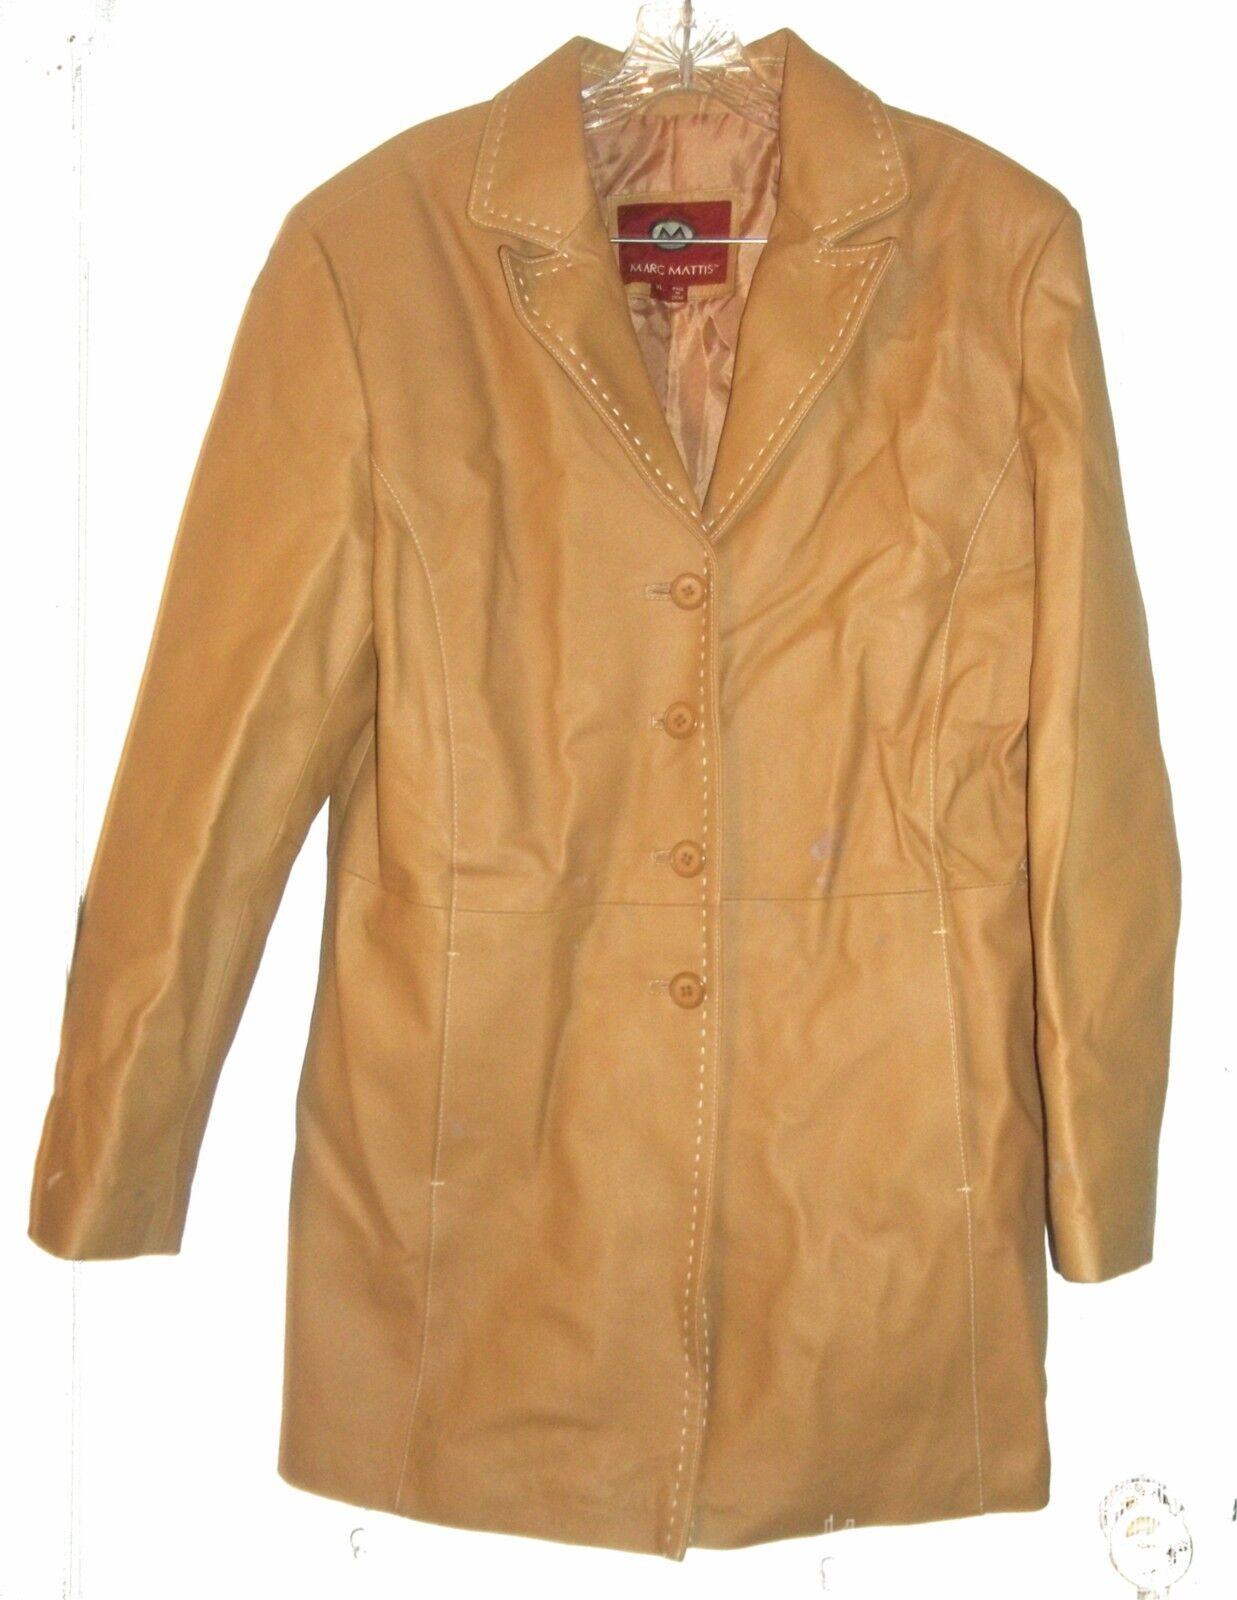 Marc Mattis Camel Brown Leather Coat White Accents Genuine Leather Coat Size XL